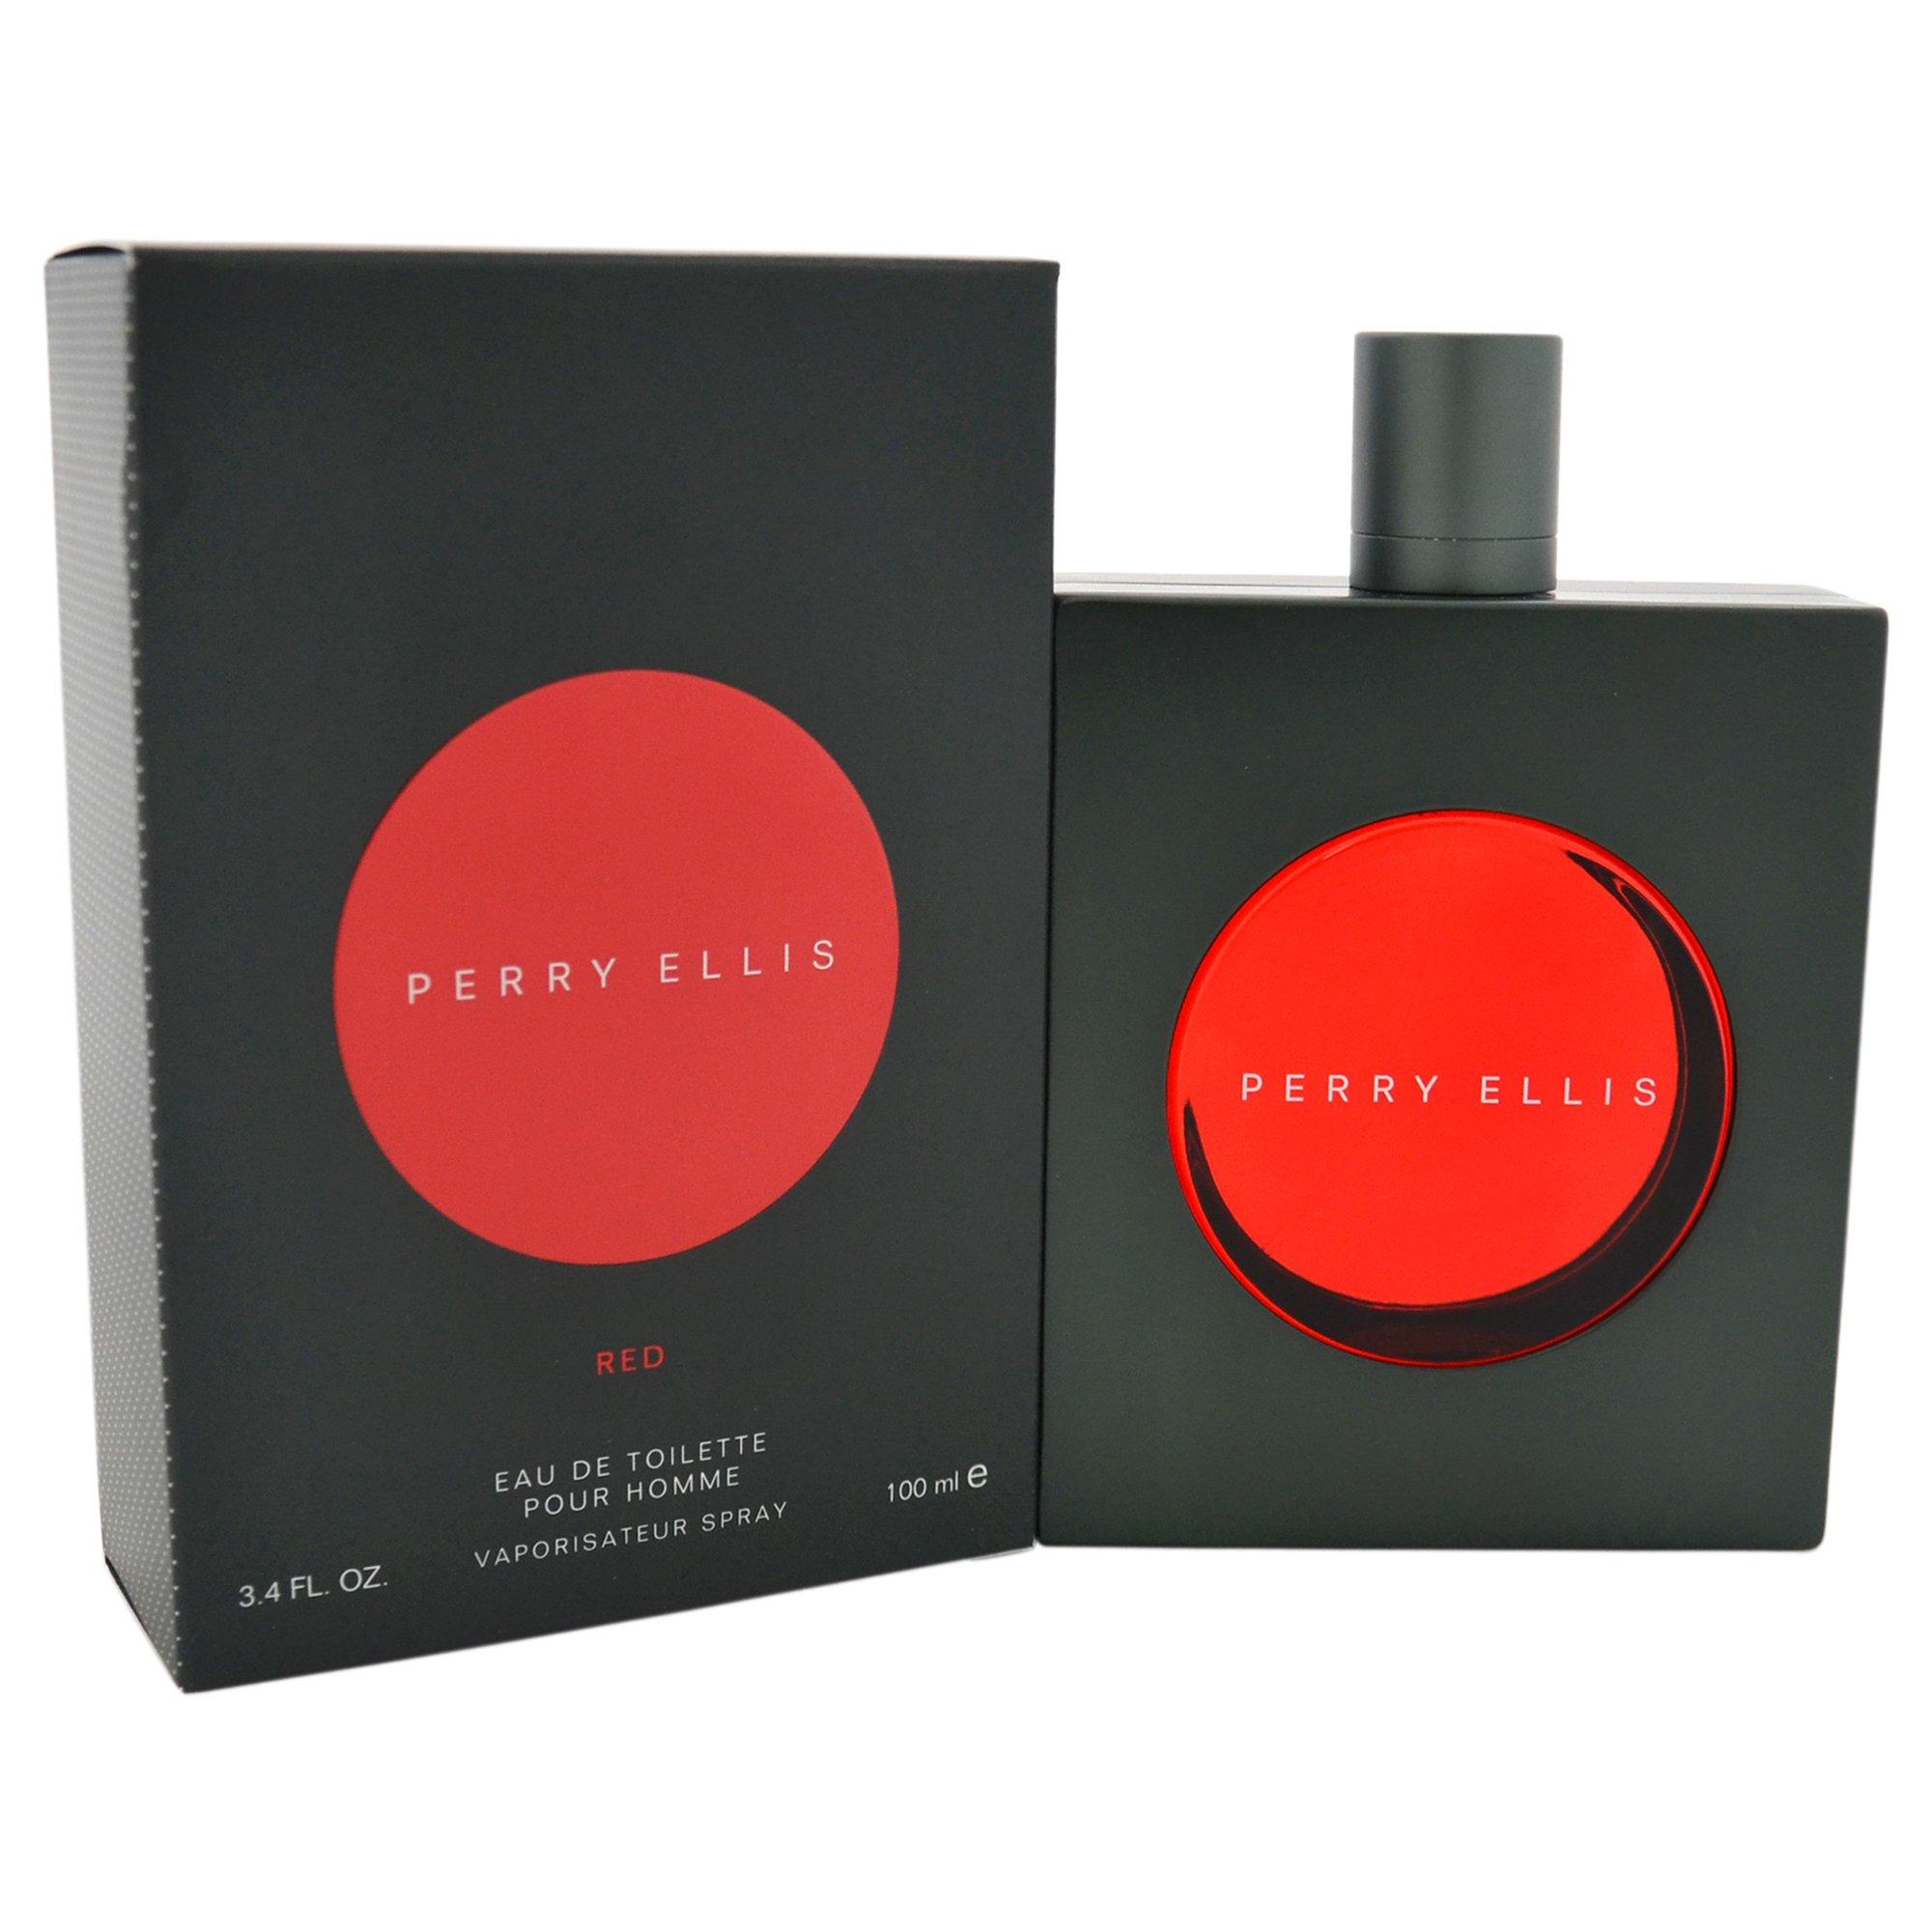 Perry Ellis RED for Men, 3.4 fl oz EDT